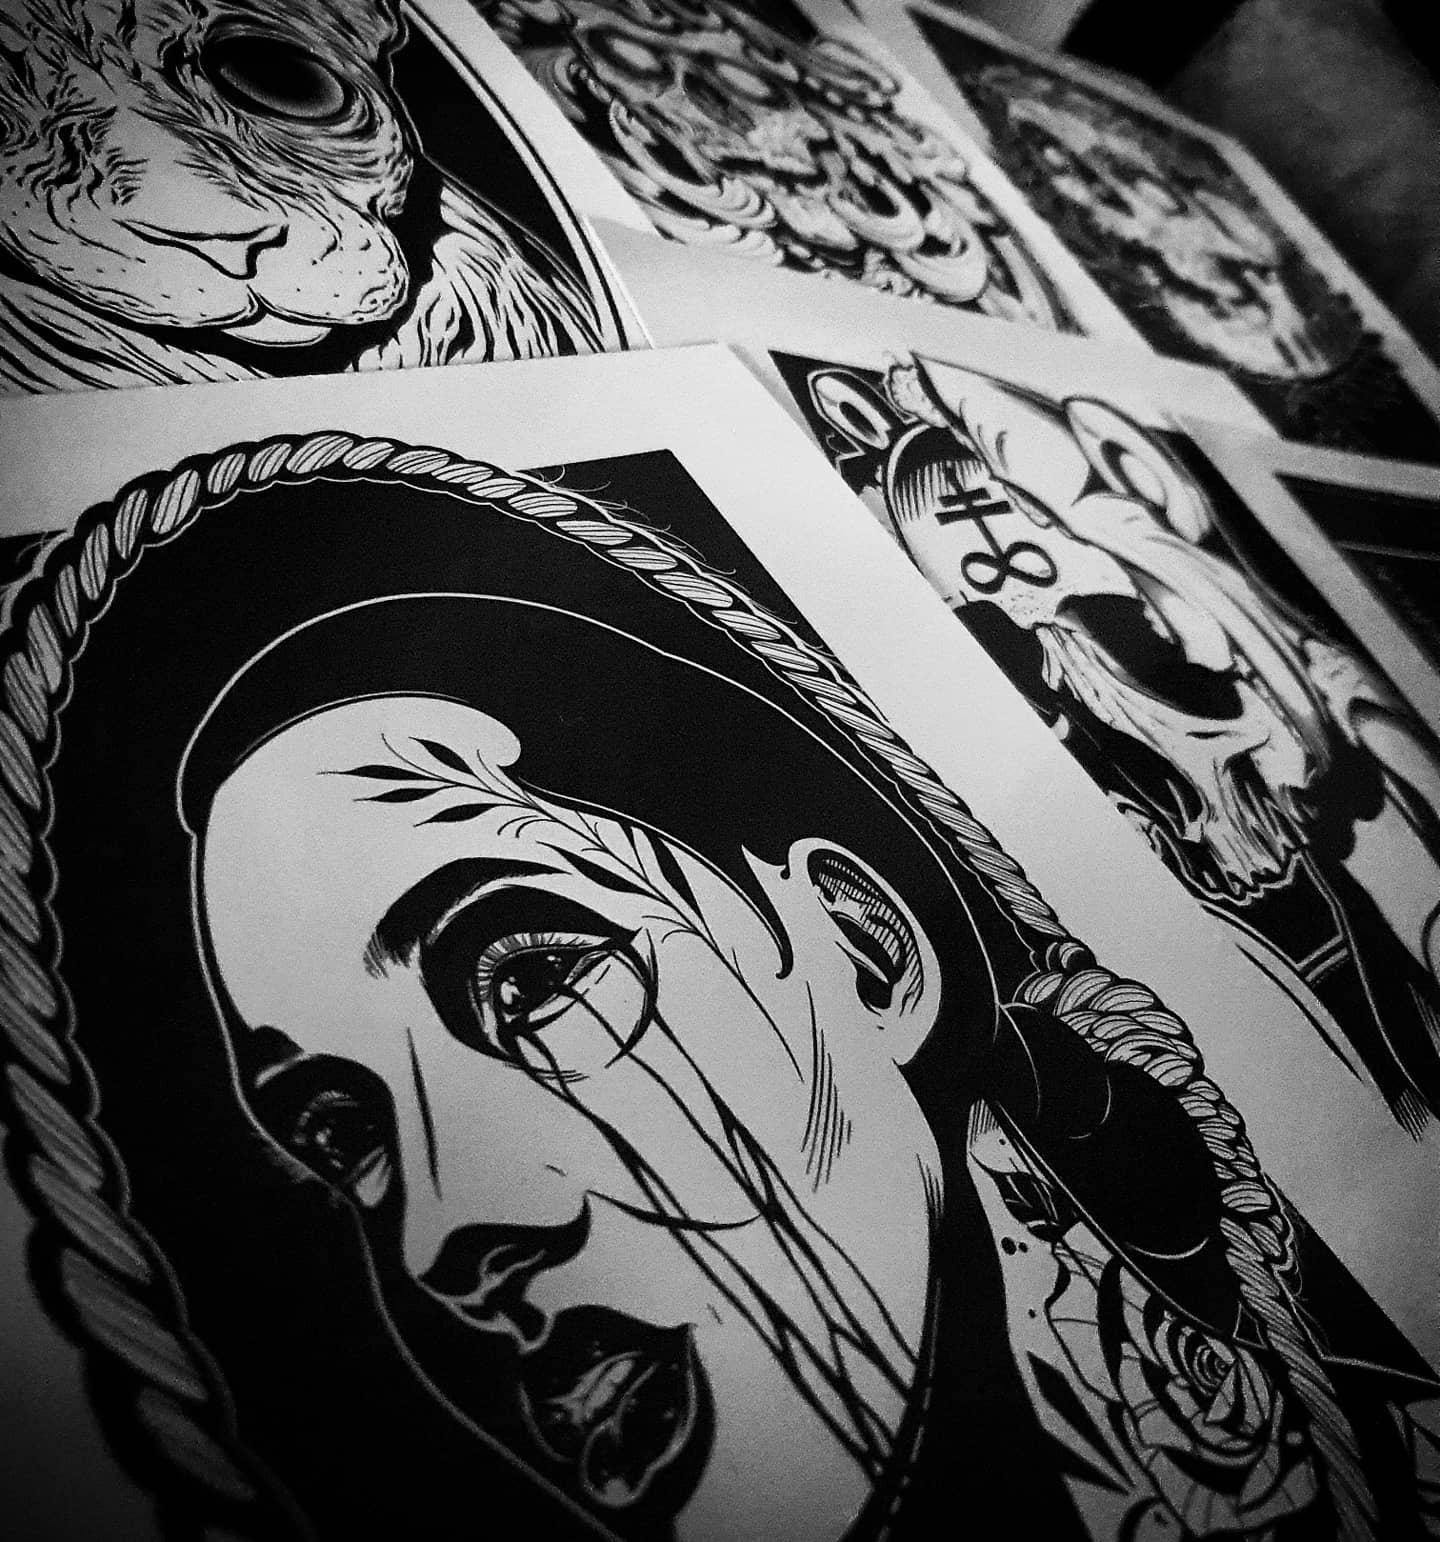 ■ P R I N T S ■ ________________ tattooprint prints artprints sale artdriven artist tattooartist creation art becreative creativeuprising artcollective artnerd scotland edinburgh edinburghtattooartist studioxiii instadrawing drawingstyle artprint drawingskills limitededition drawingchallenge mydrawings feature_my_stuff artdaily art_spotlight horror artjobsmag